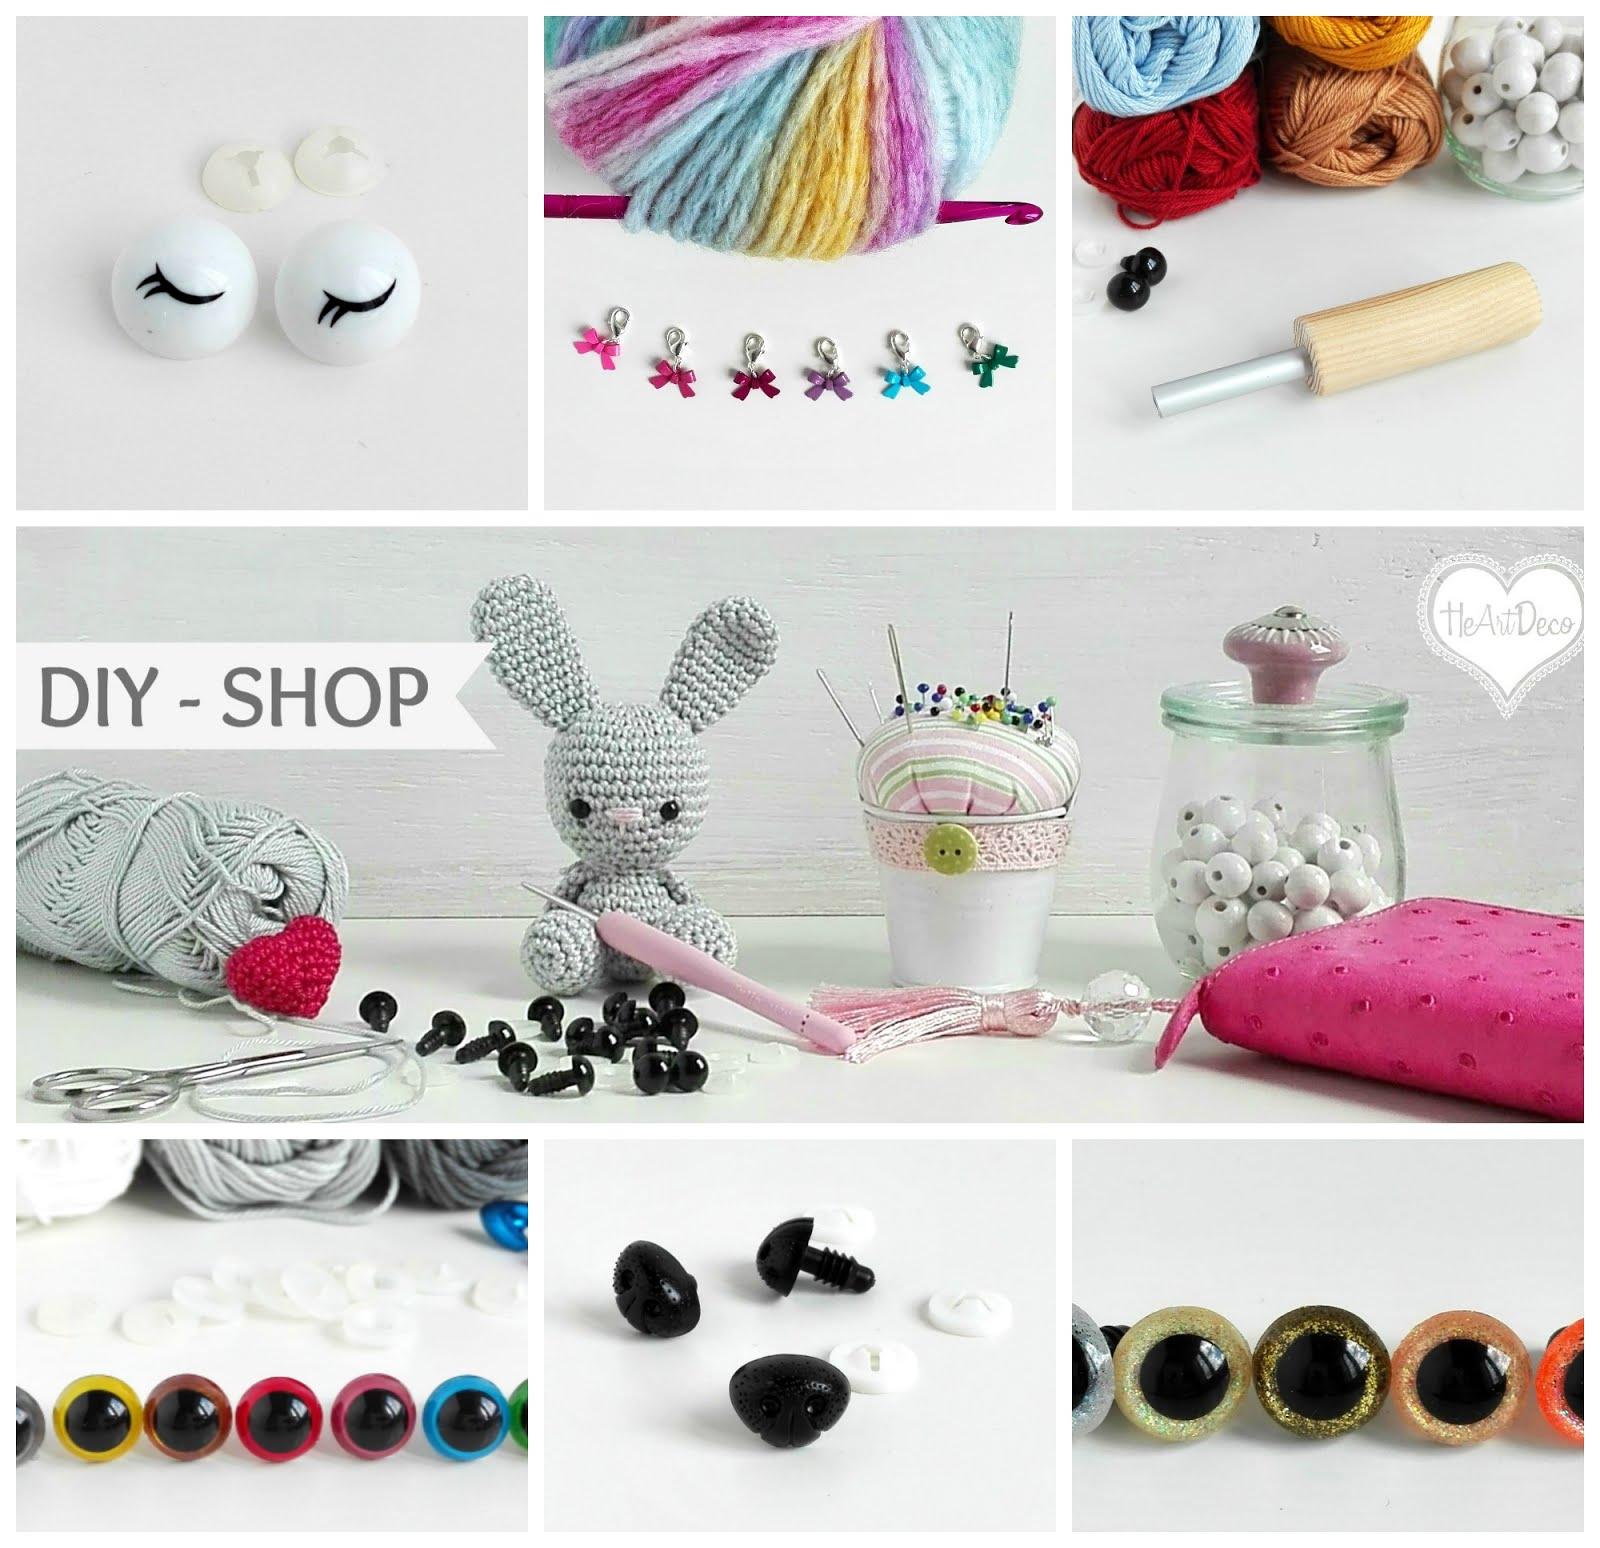 DIY Shop